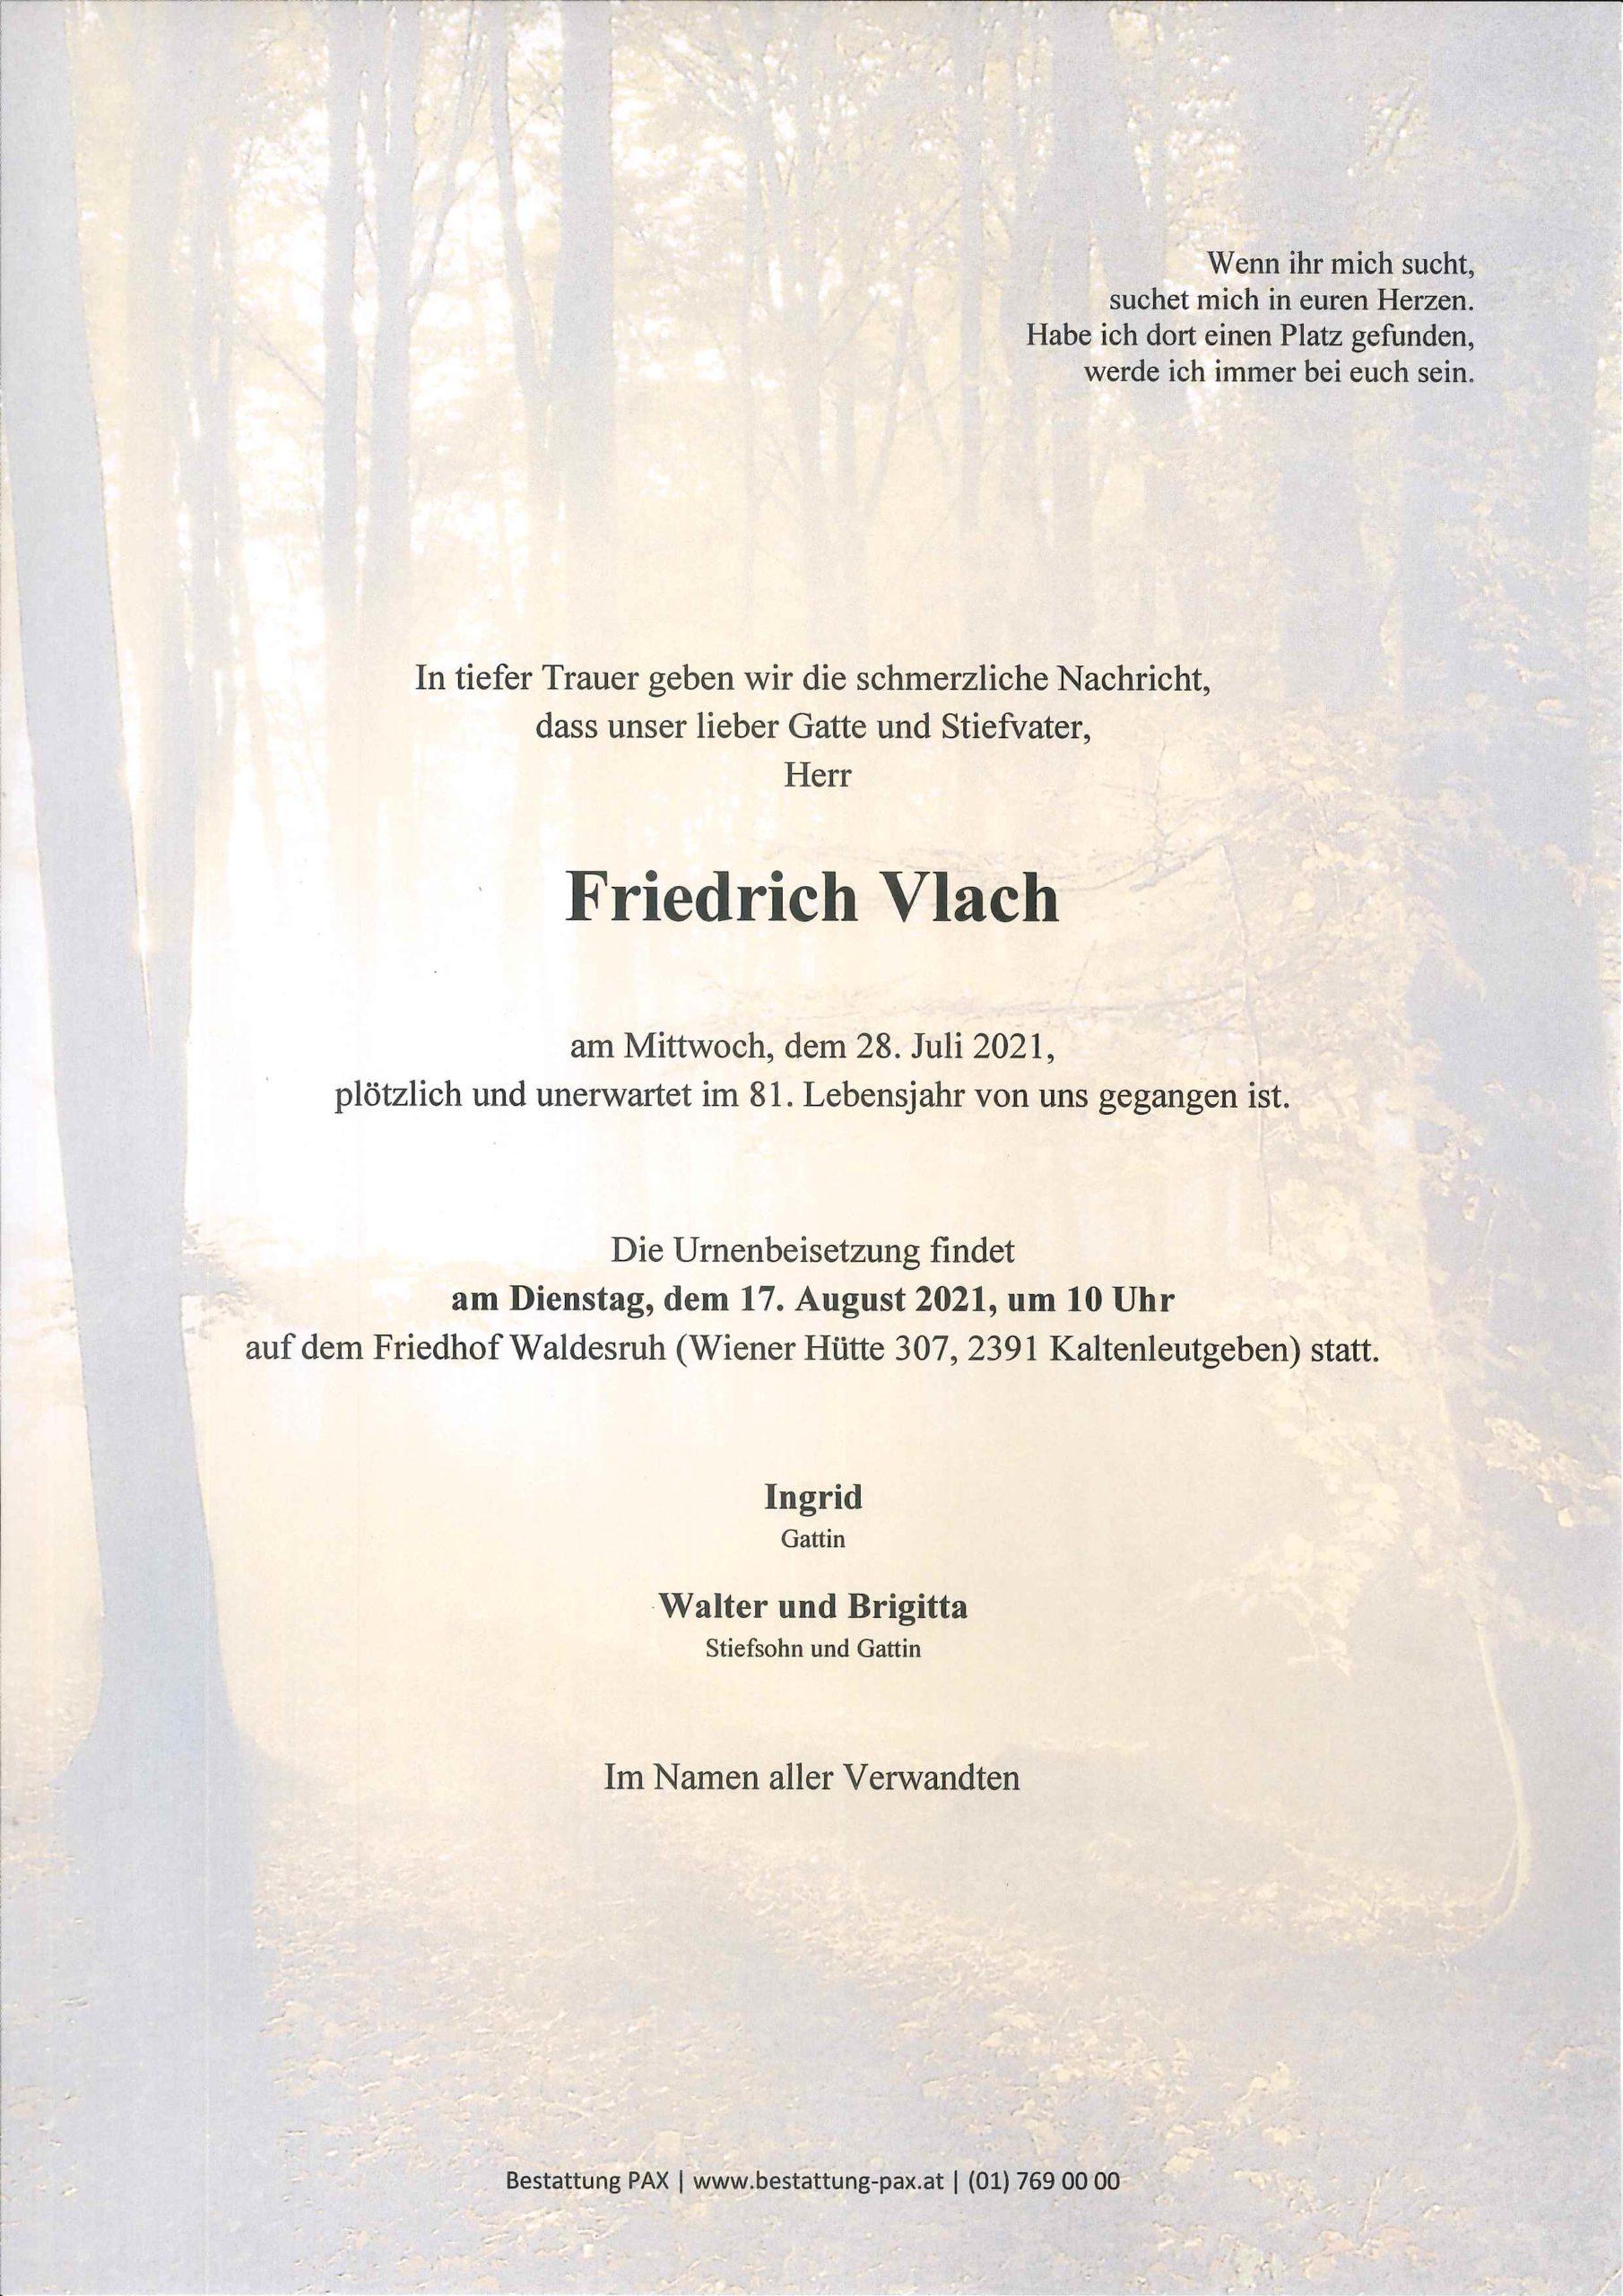 Friedrich Vlach